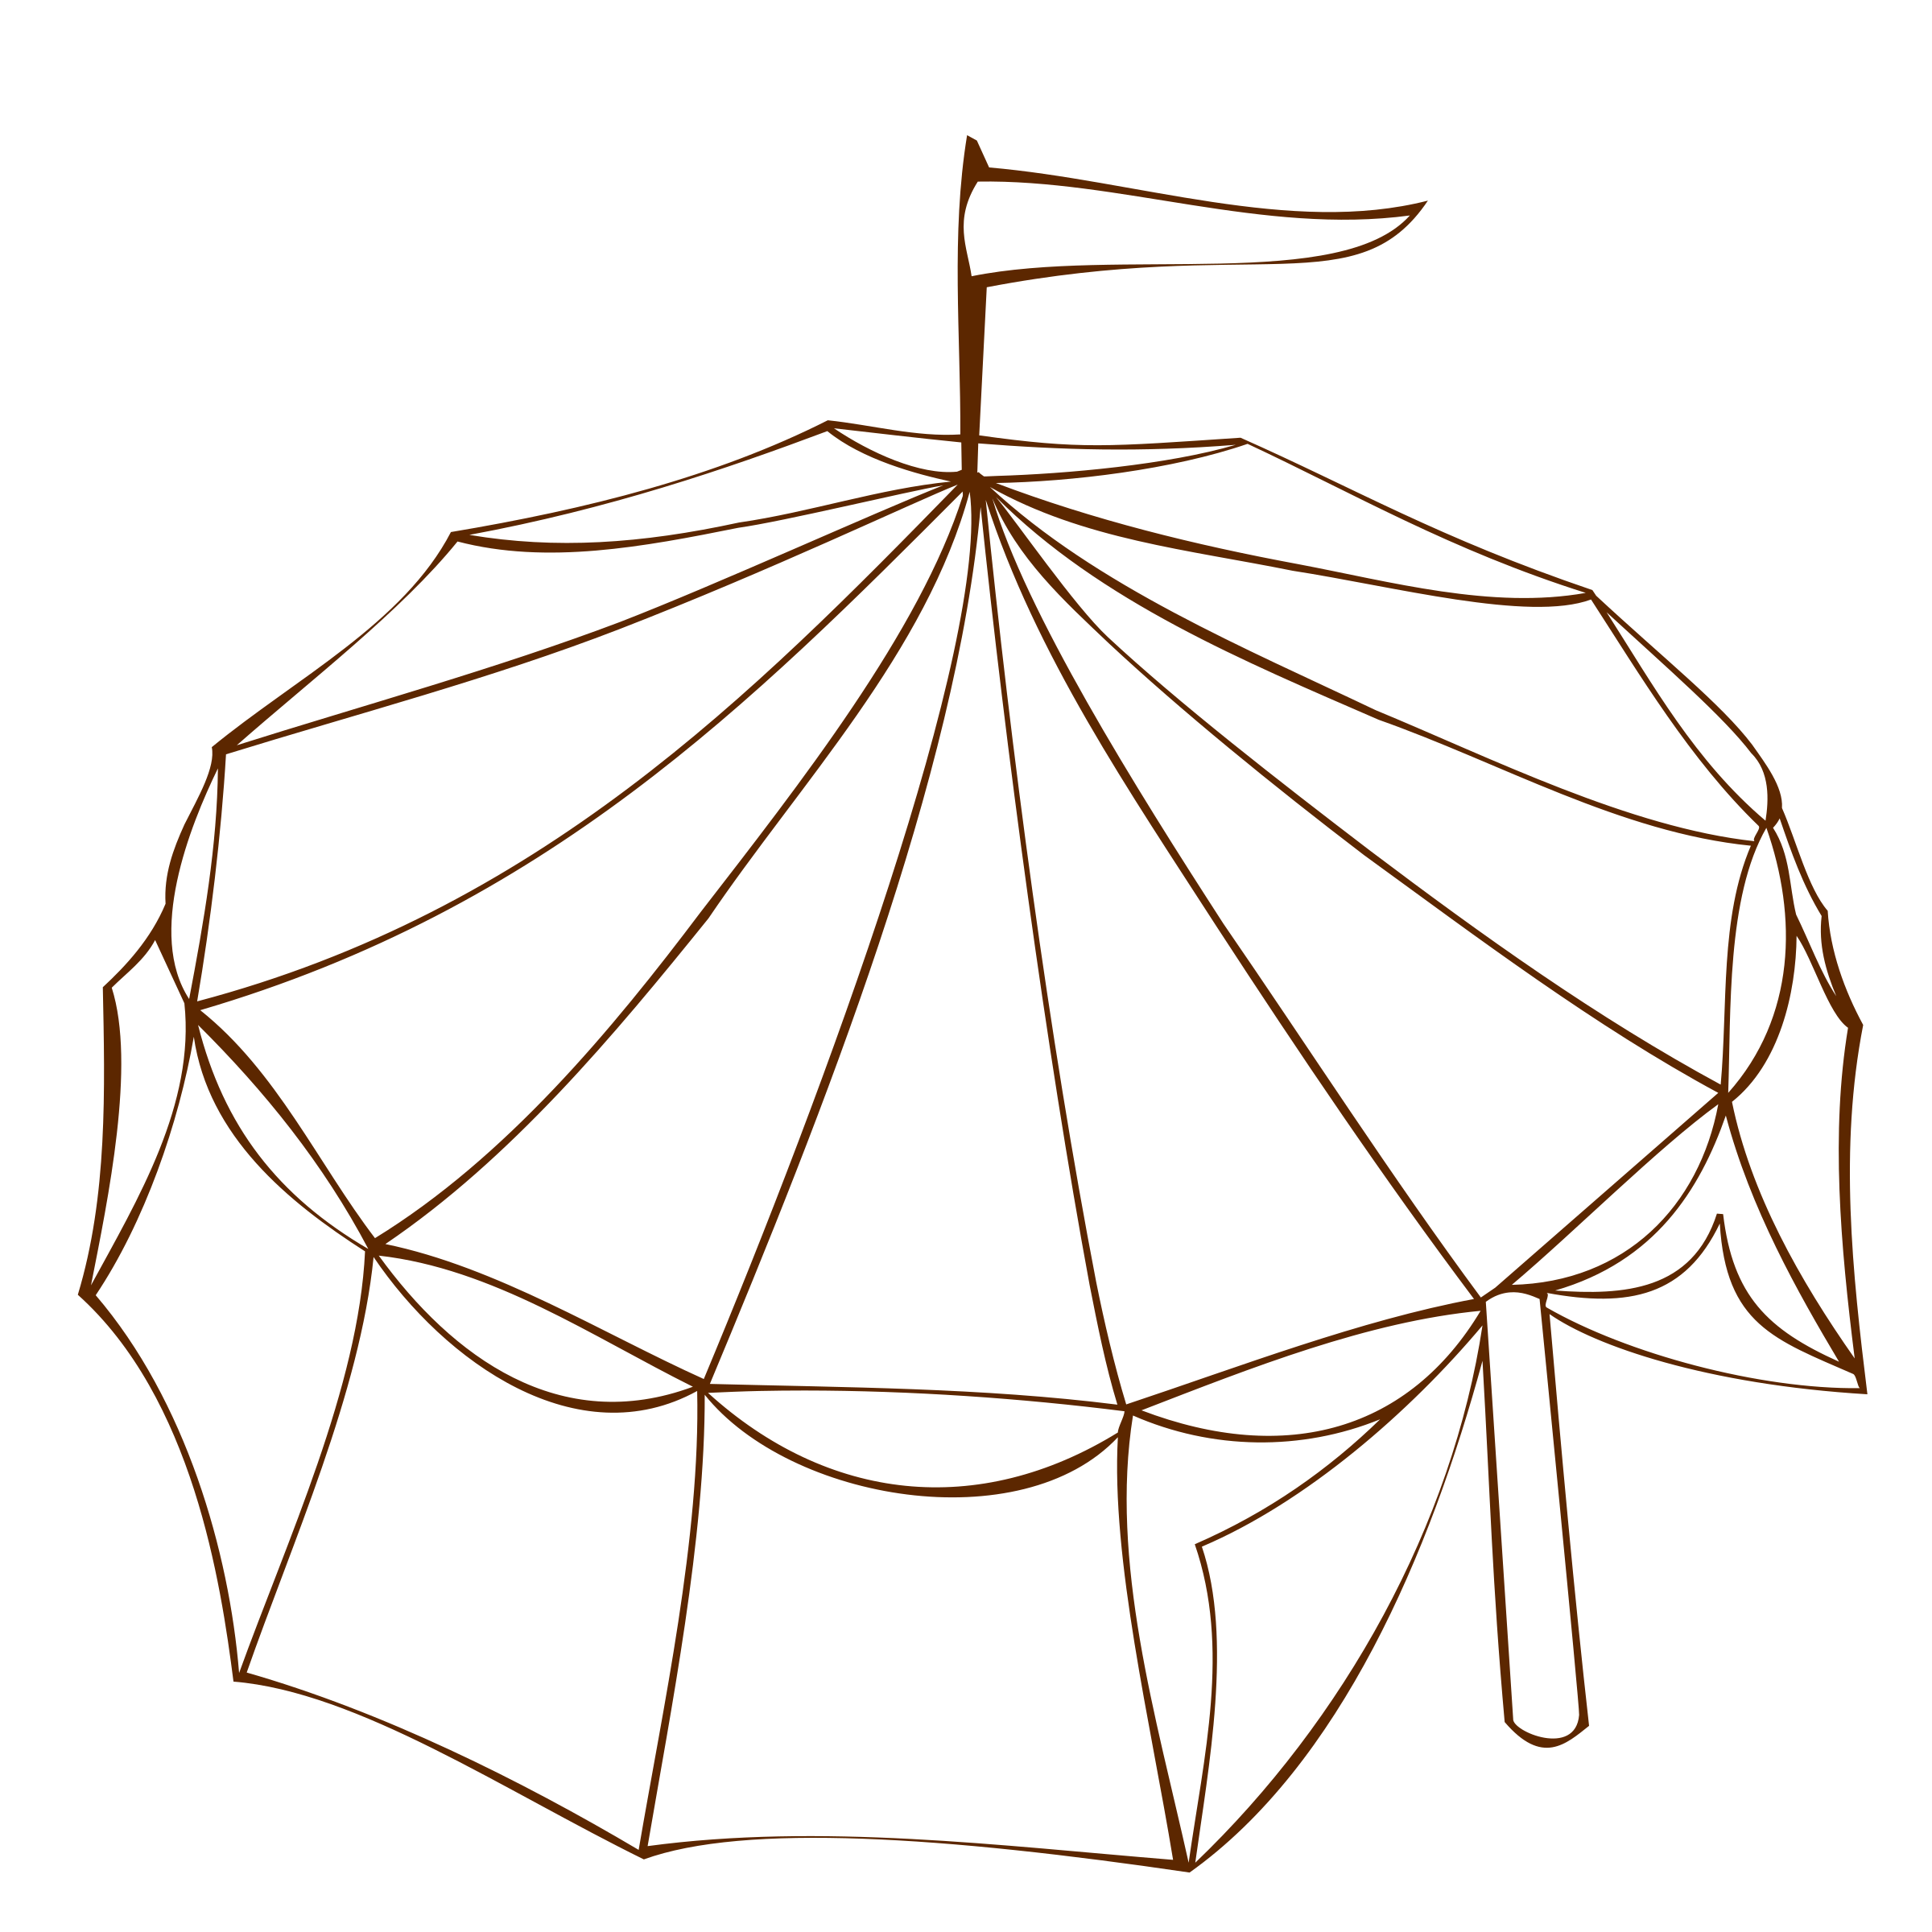 Clipart tent tent house. Rpg map symbols circus